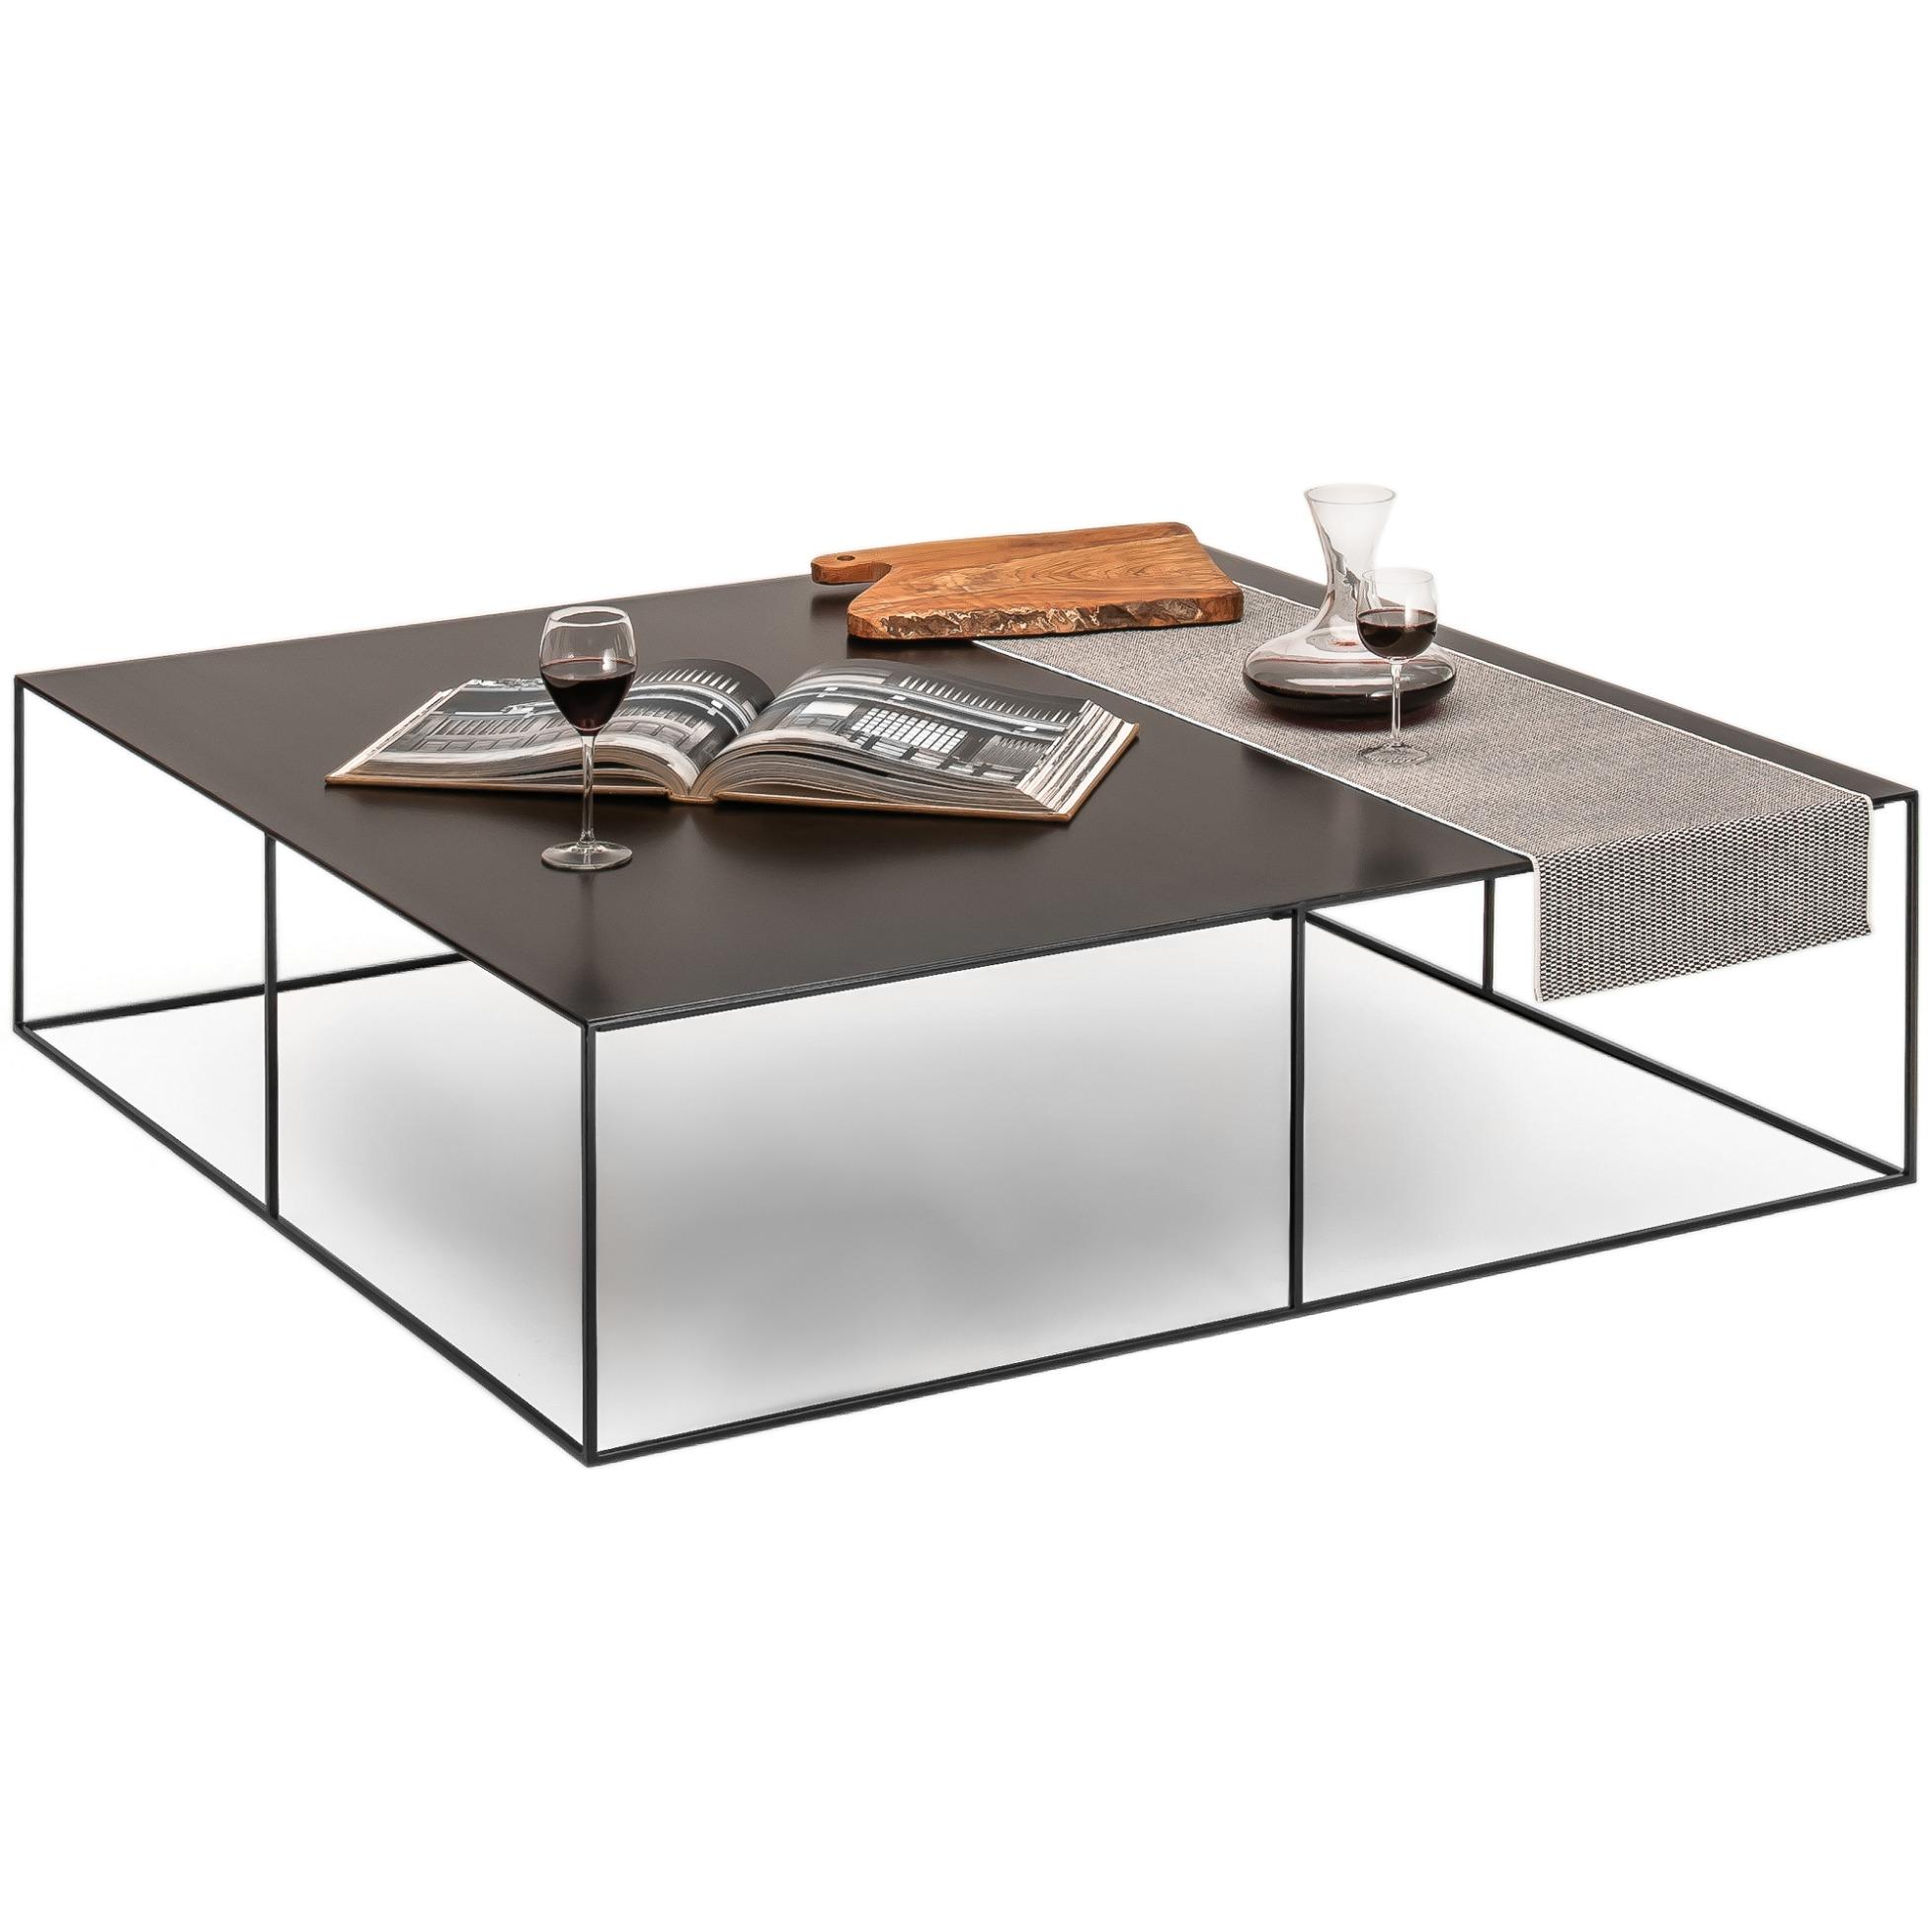 Slim Irony Coffee Table By Zeus